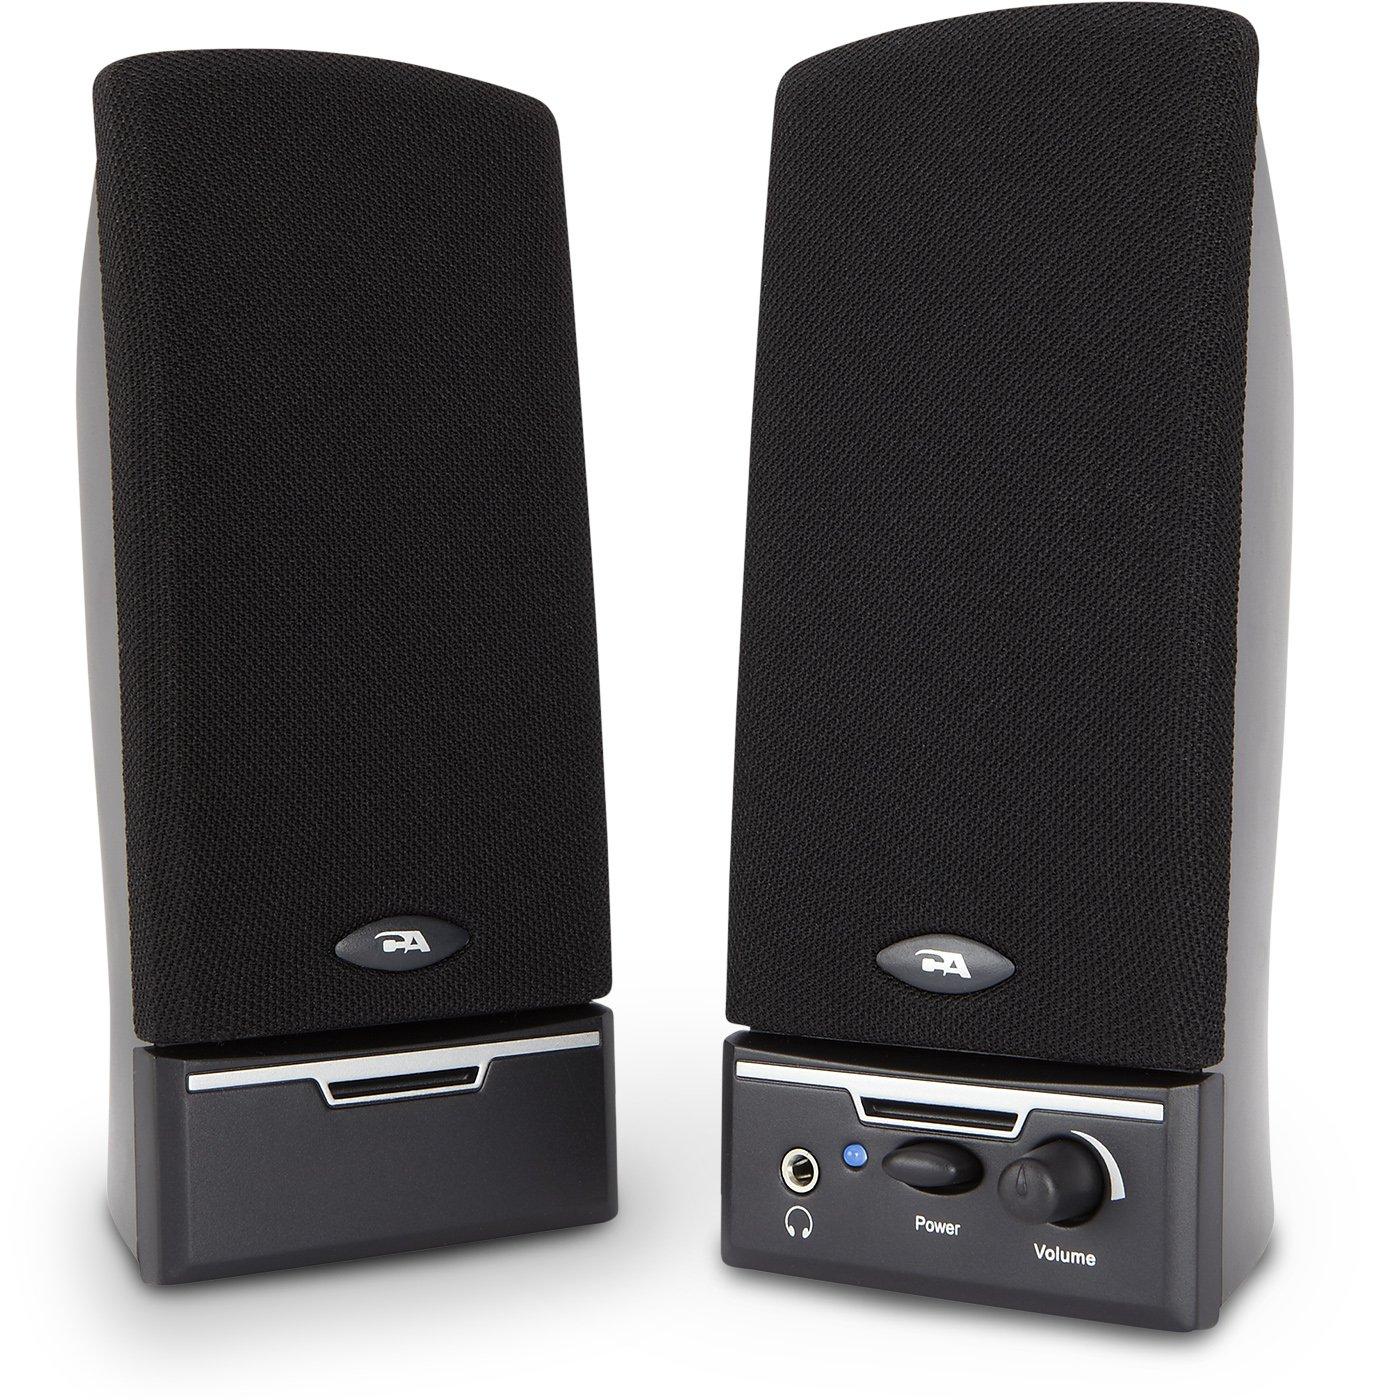 Cyber Acoustics CA-2014 multimedia desktop computer speakers by Cyber Acoustics (Image #1)